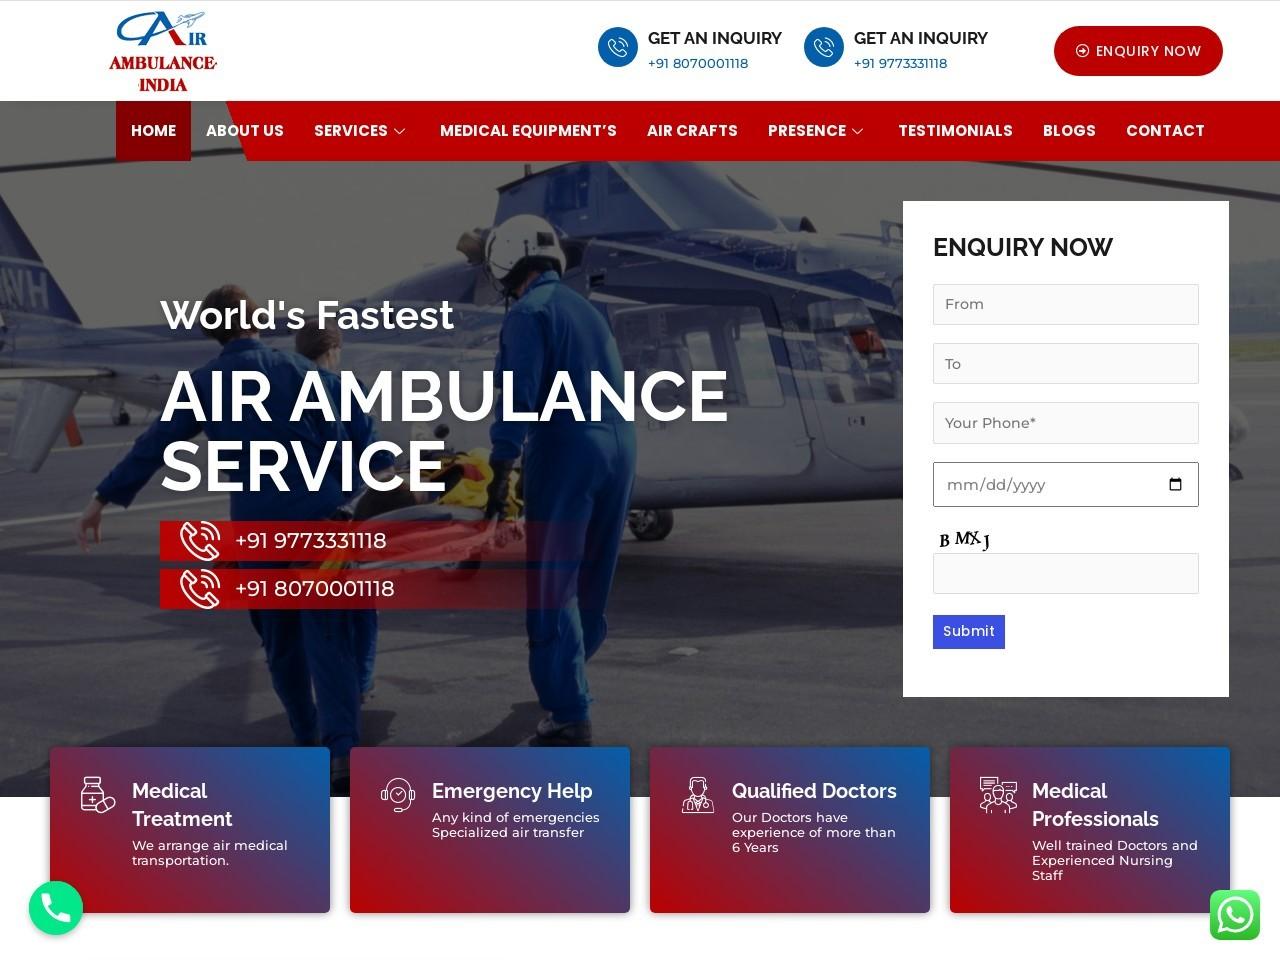 Low Cost Air Ambulance Services in Kolkata